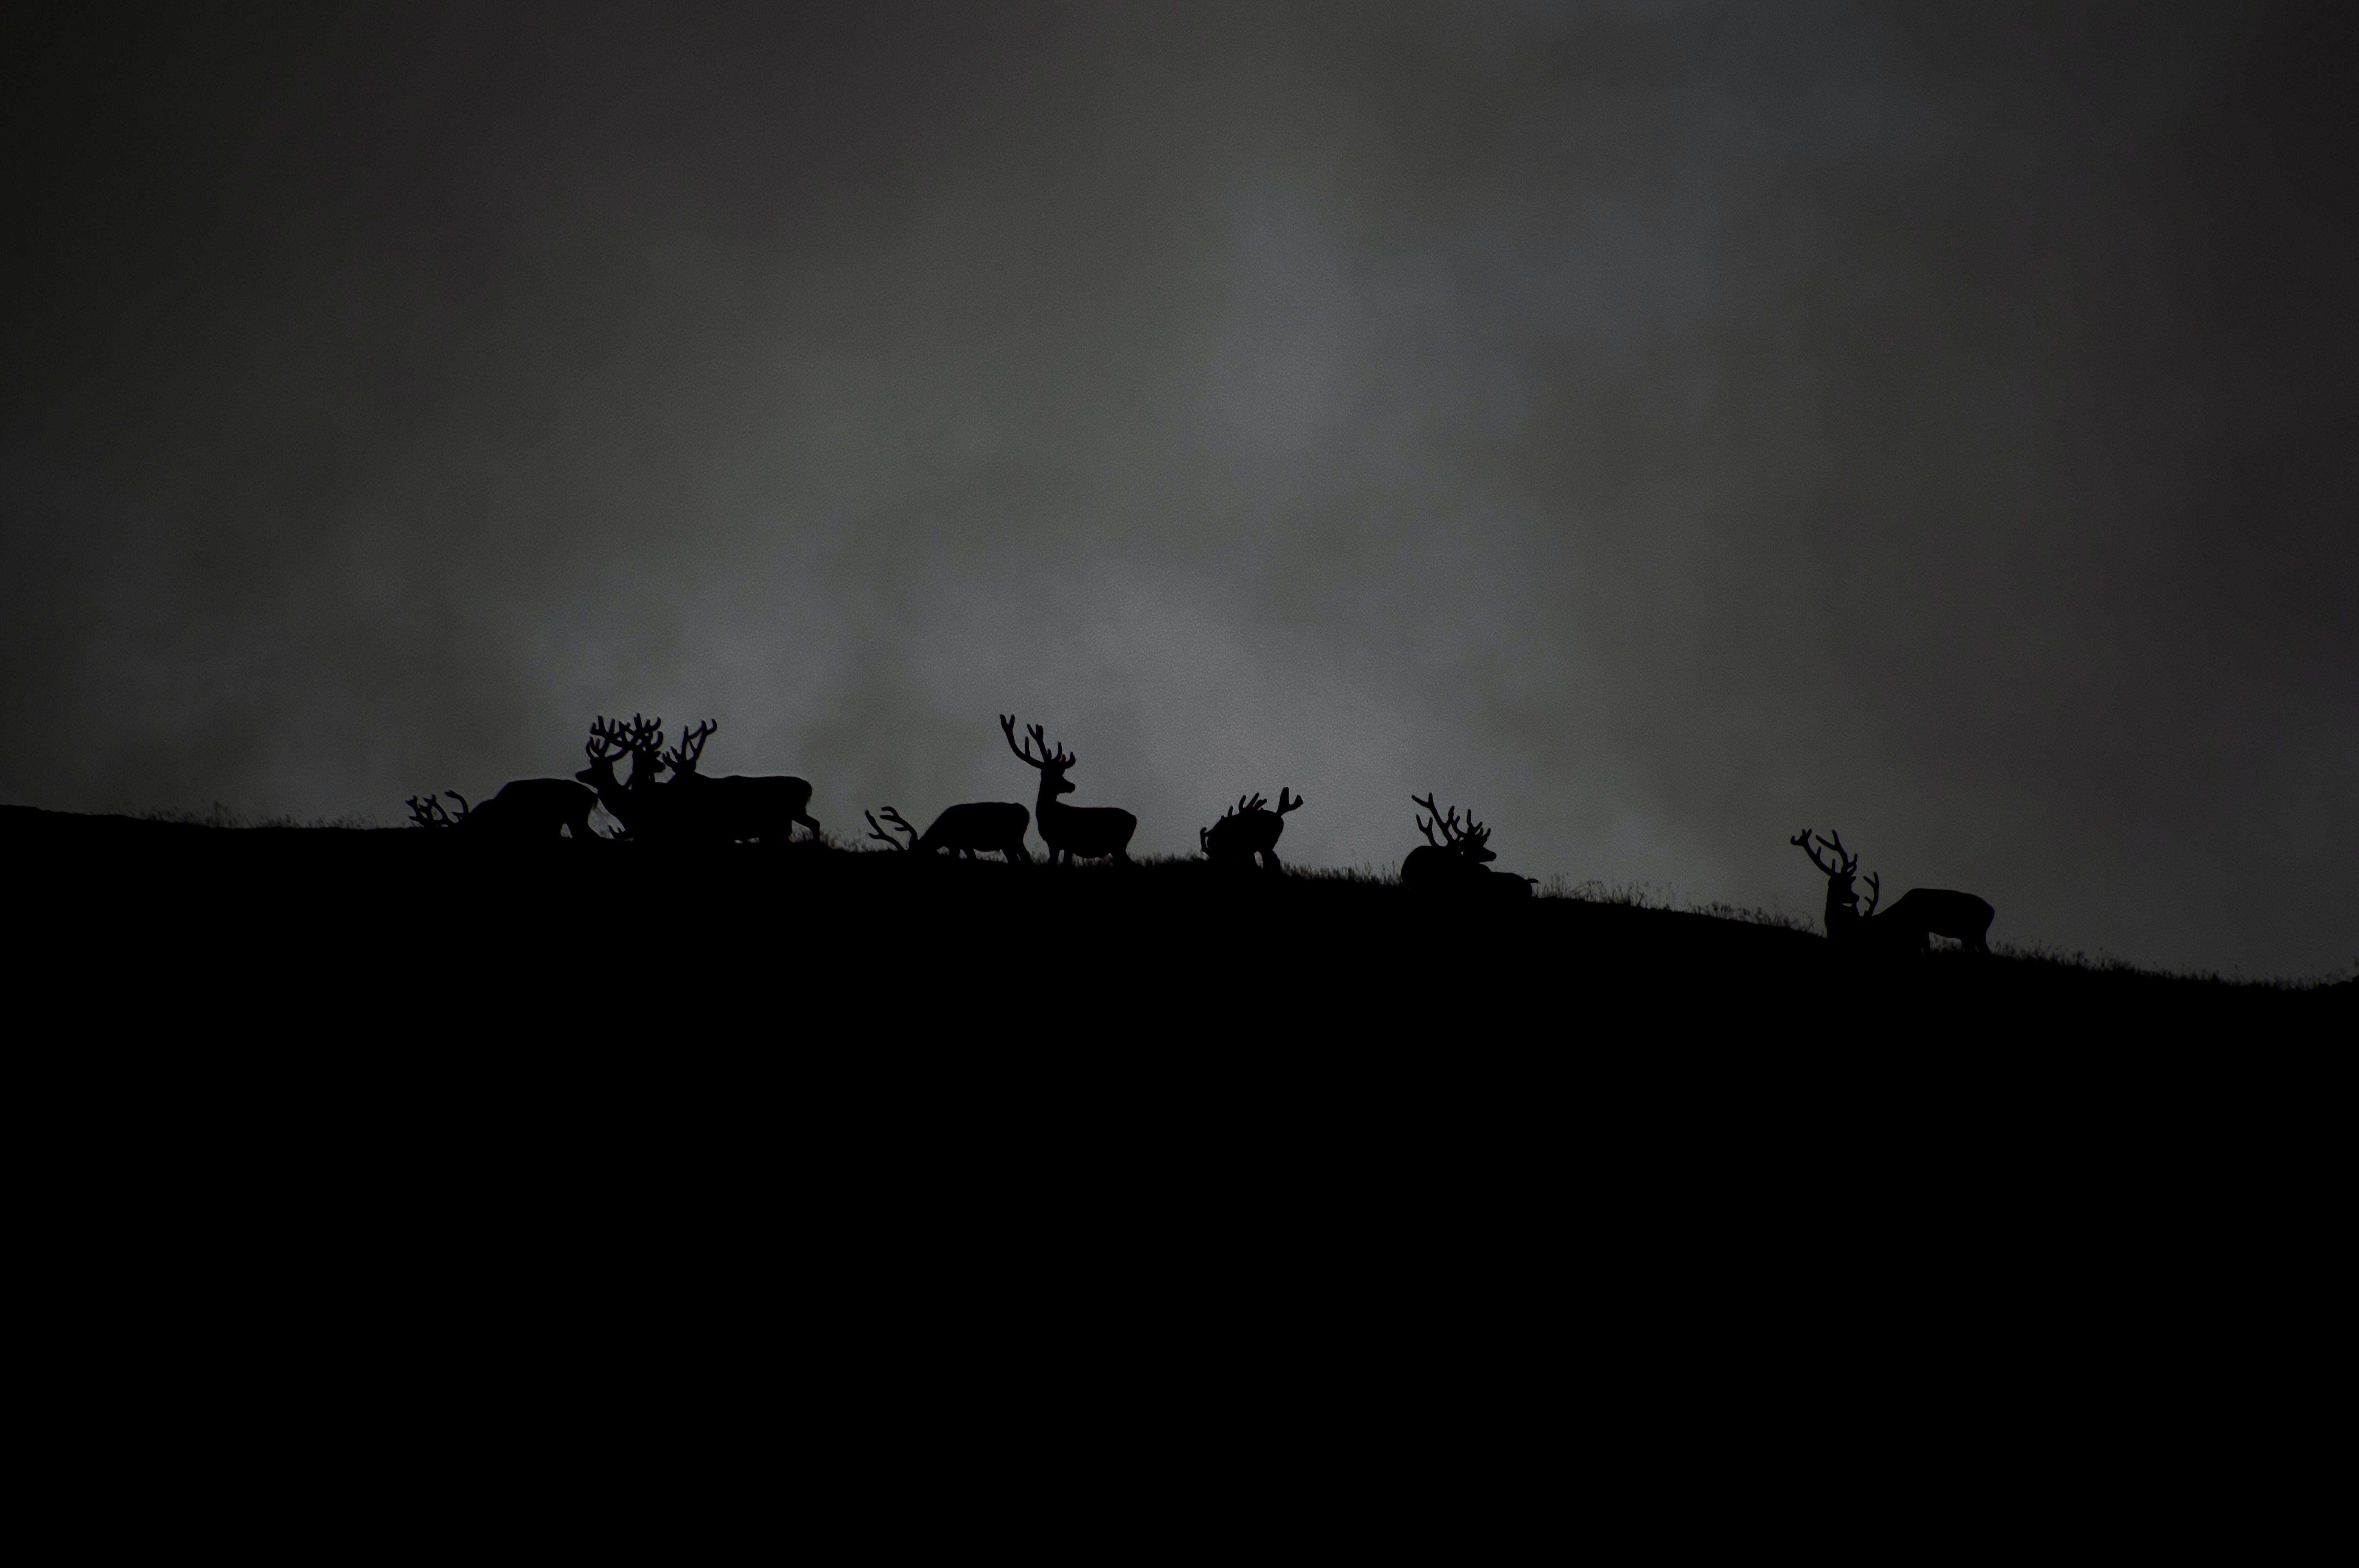 silhouette of herd of deer under cloudy sky